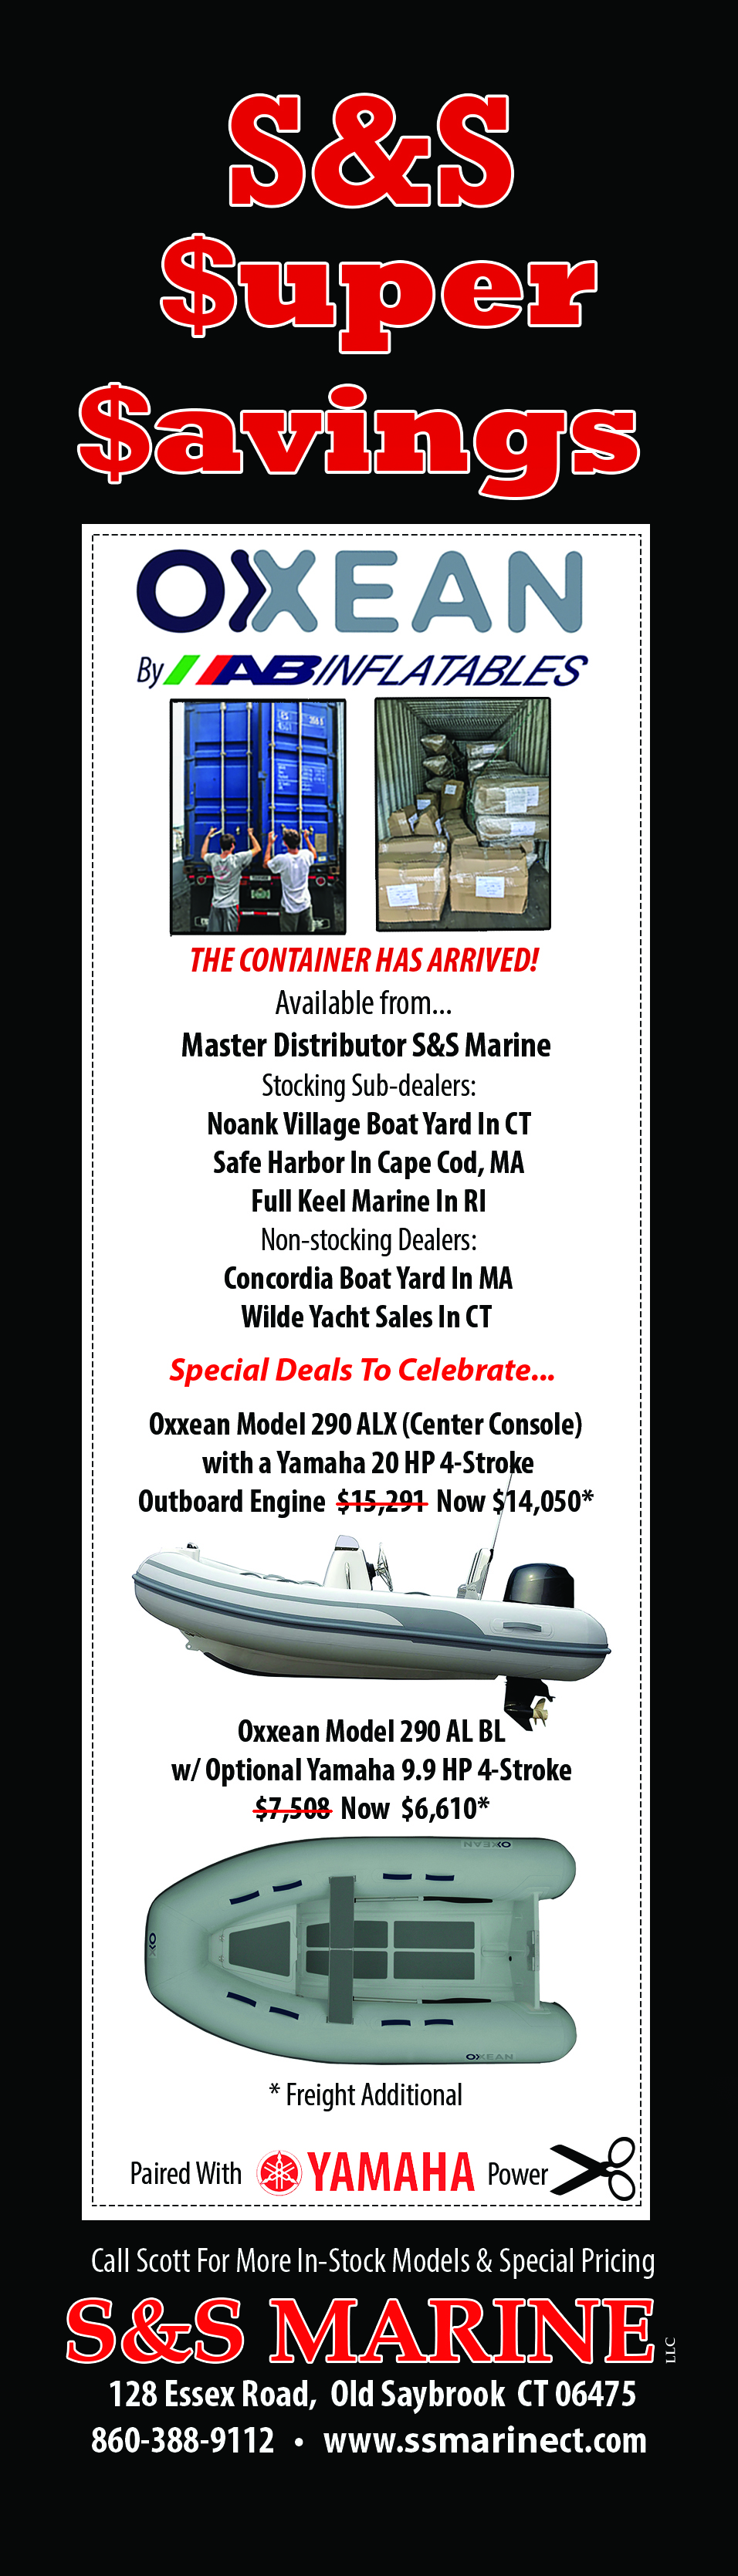 S&S Marine LLC | S&S Marine LLC Old Saybrook CT 860-388-9112